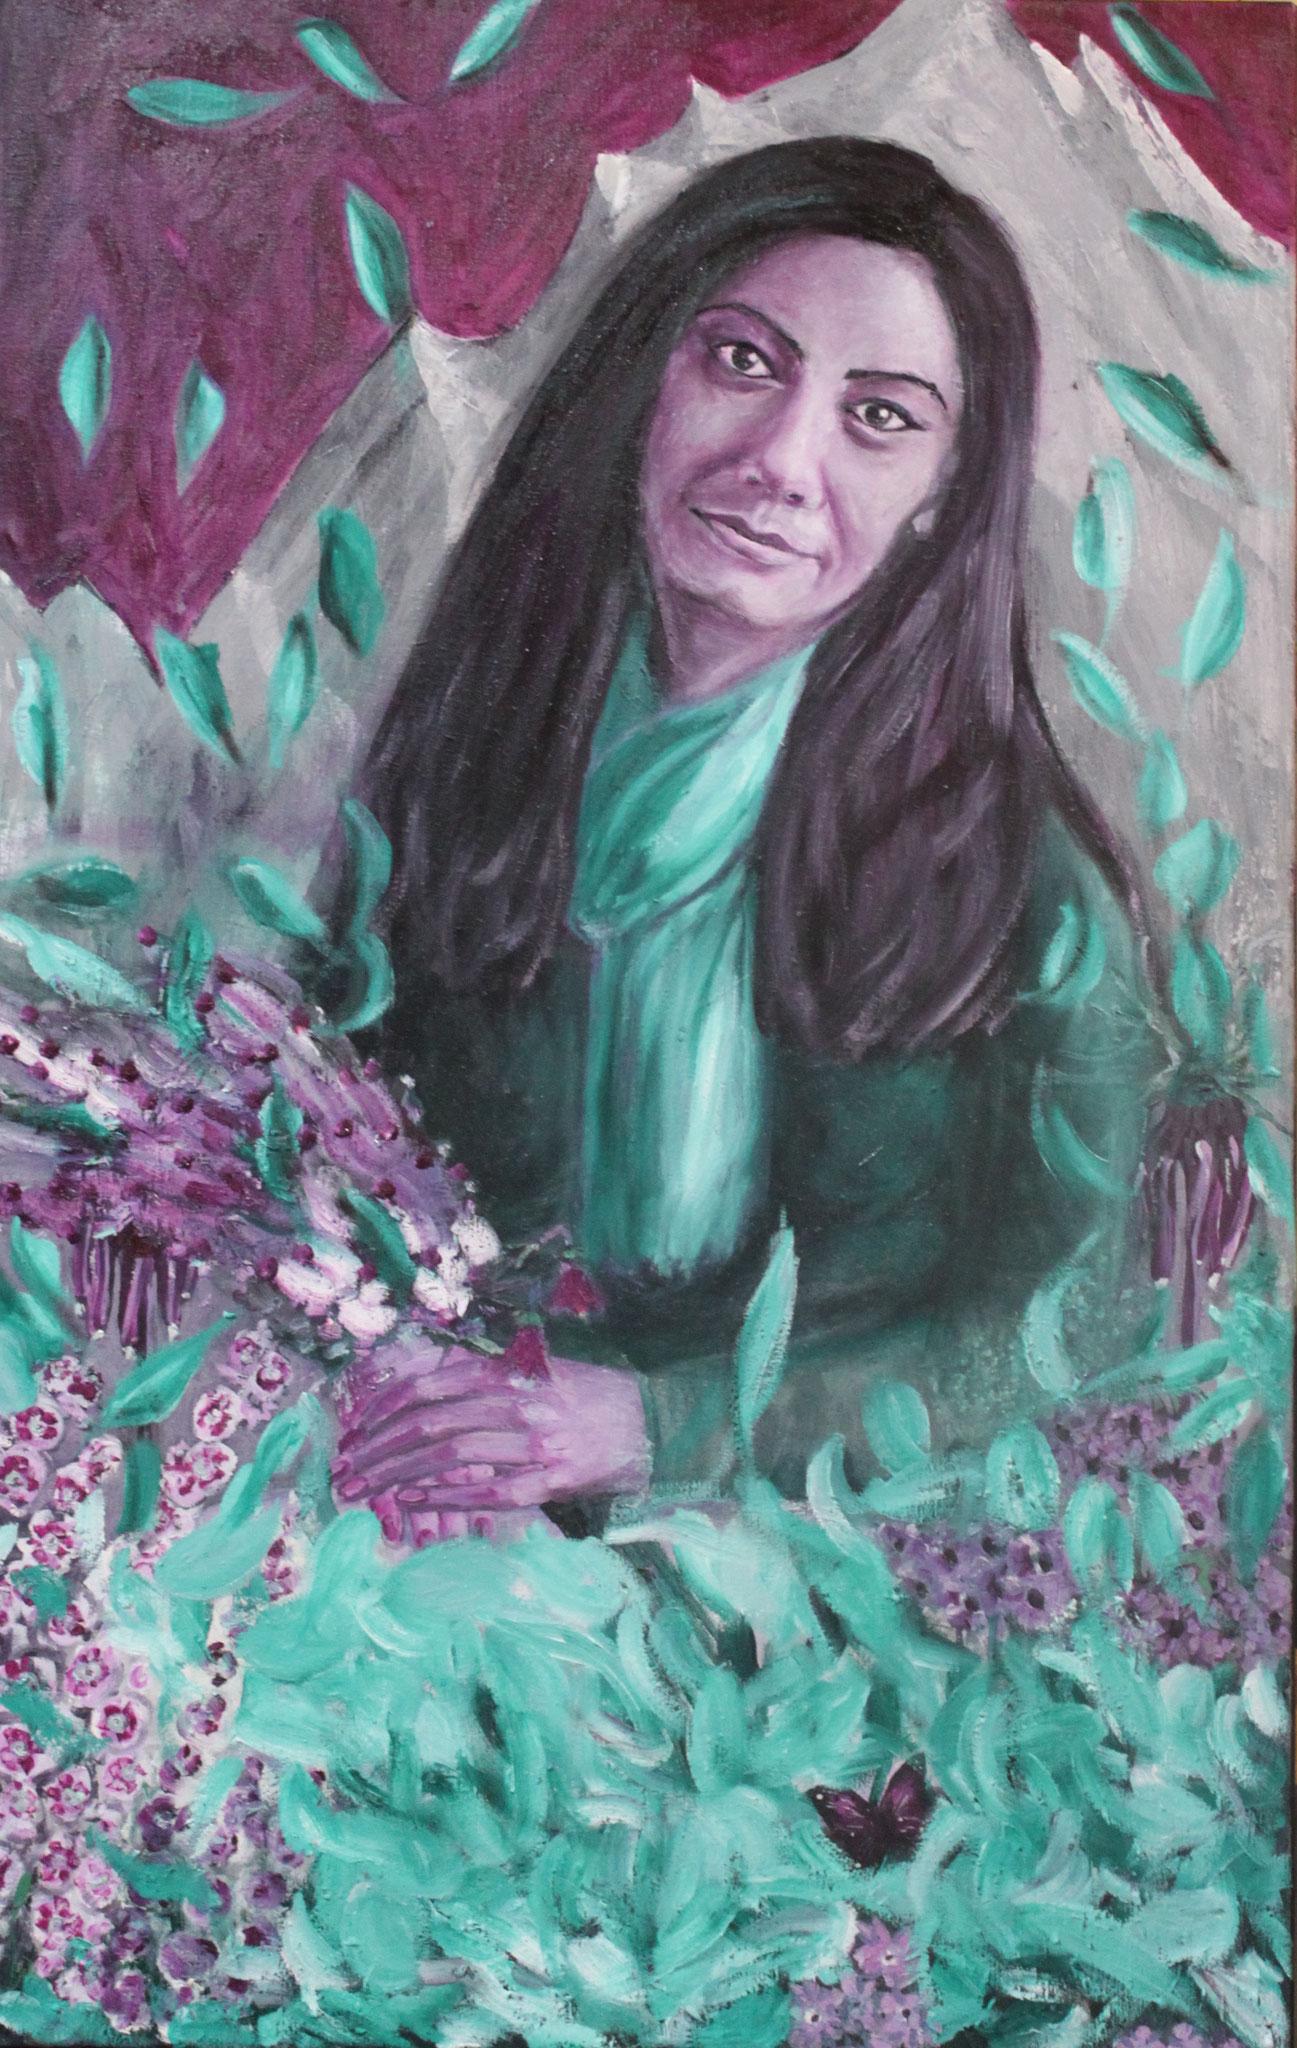 Marwa, Öl auf Leinwand, 110 cm x 70 cm, 2015